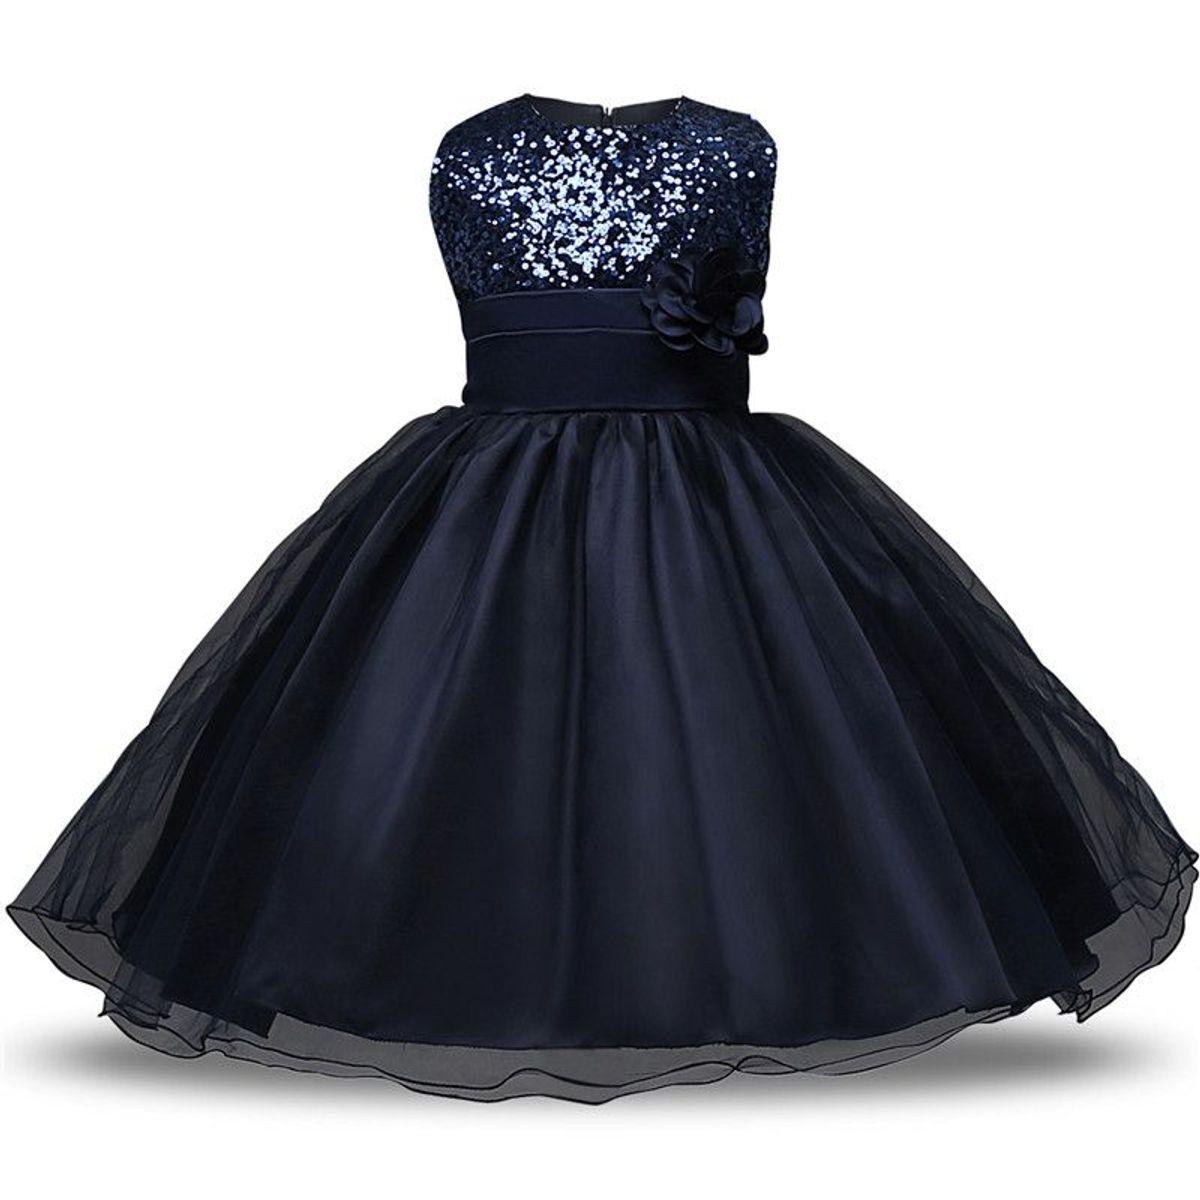 0ebb4c6dd44548 vestido infantil paetês - tamanho 4 anos